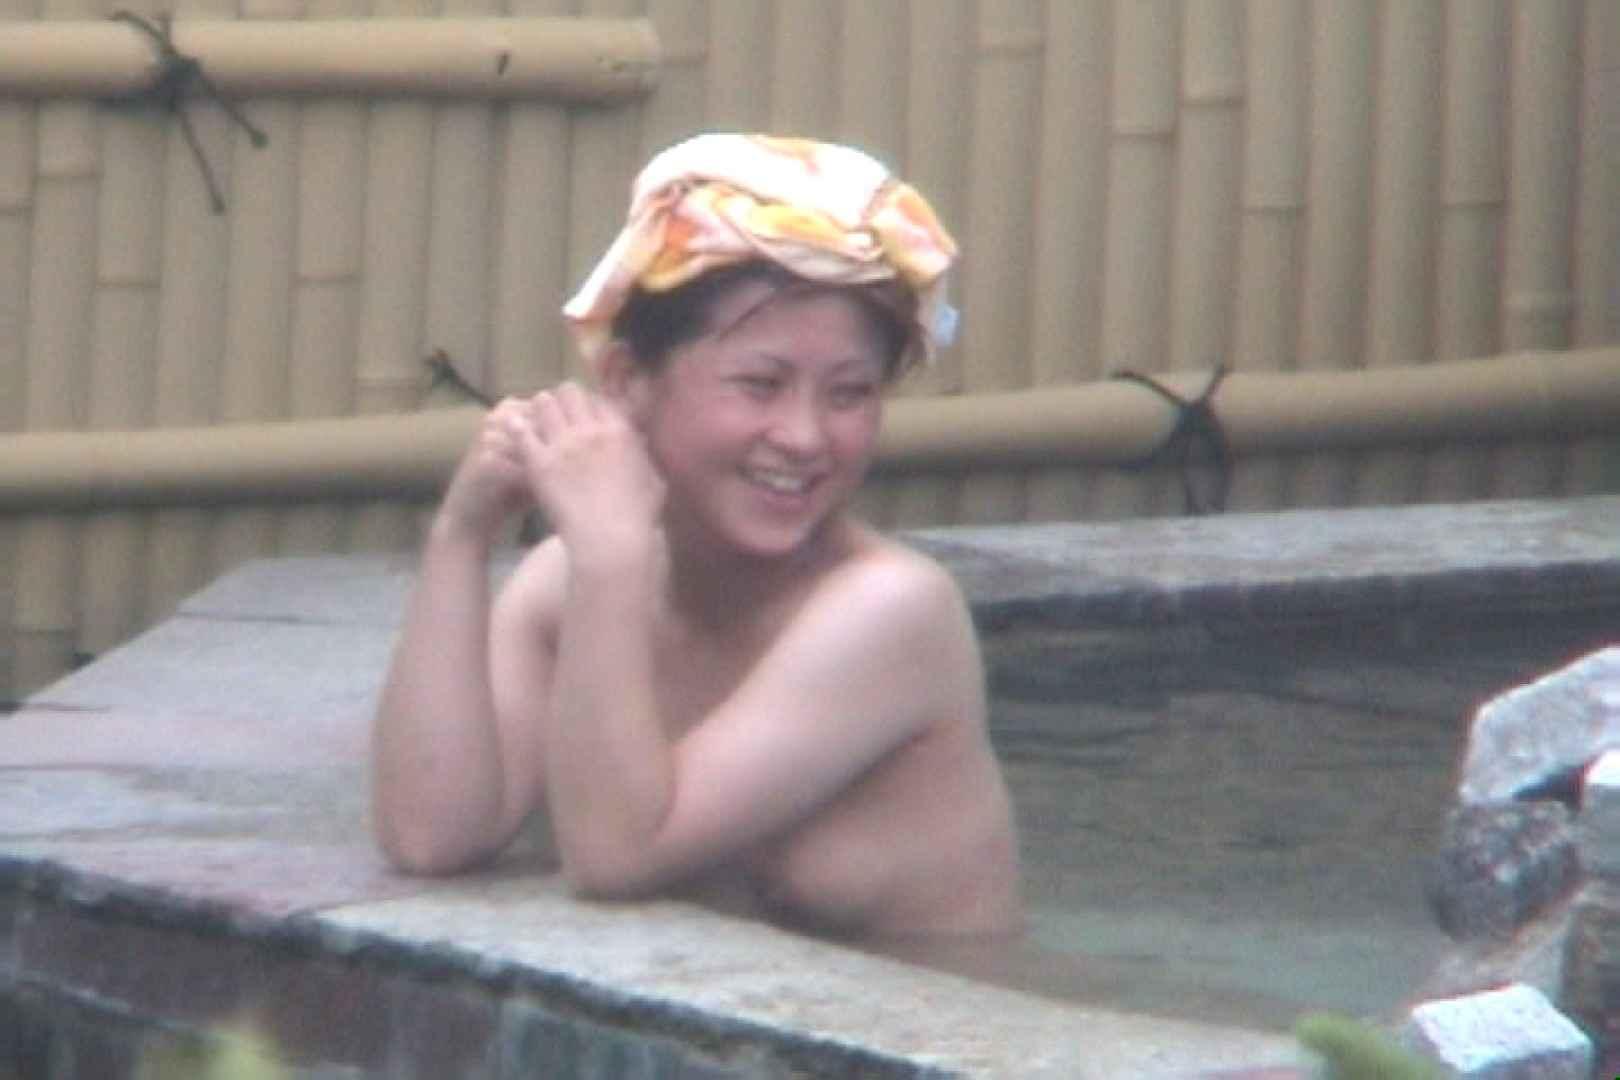 Aquaな露天風呂Vol.48【VIP限定】 露天風呂編  97PIX 62